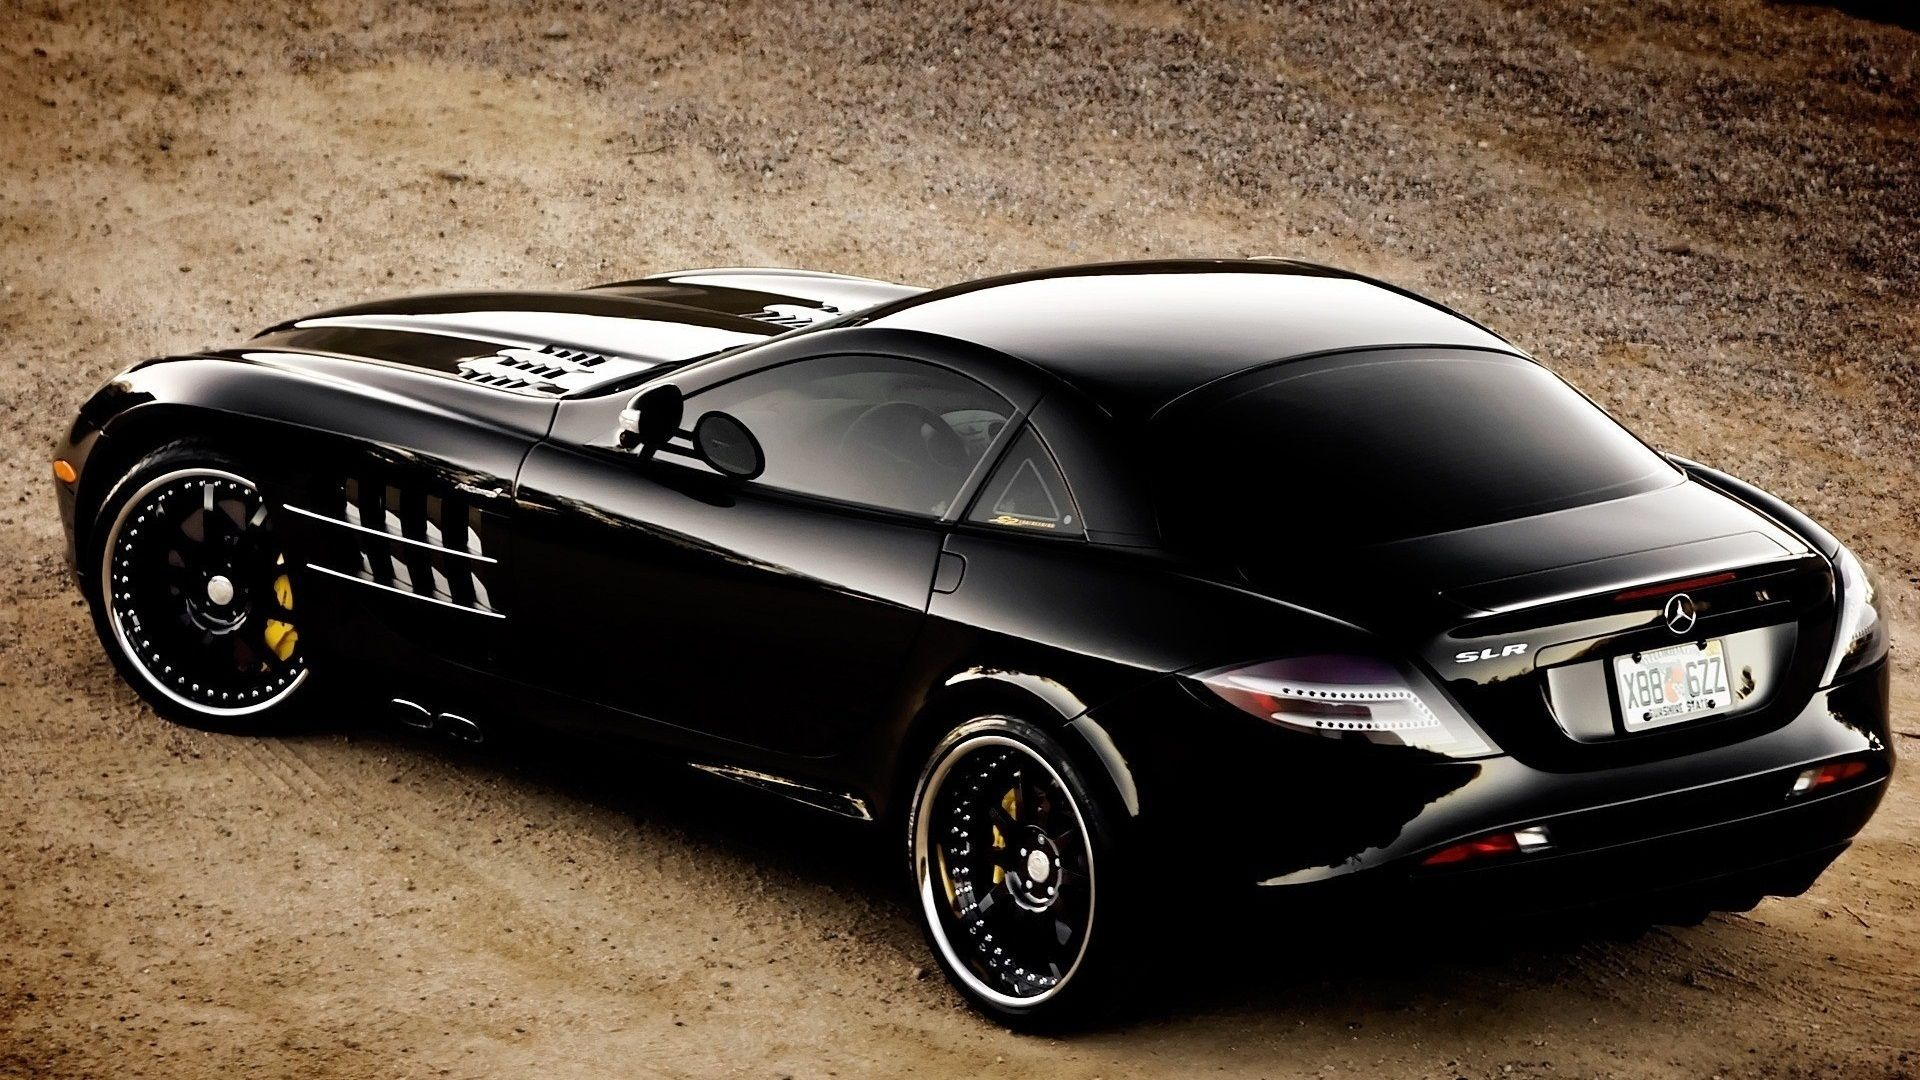 mercedes benz slr mclaren black is a beauty exotic cars pinterest slr mclaren. Black Bedroom Furniture Sets. Home Design Ideas